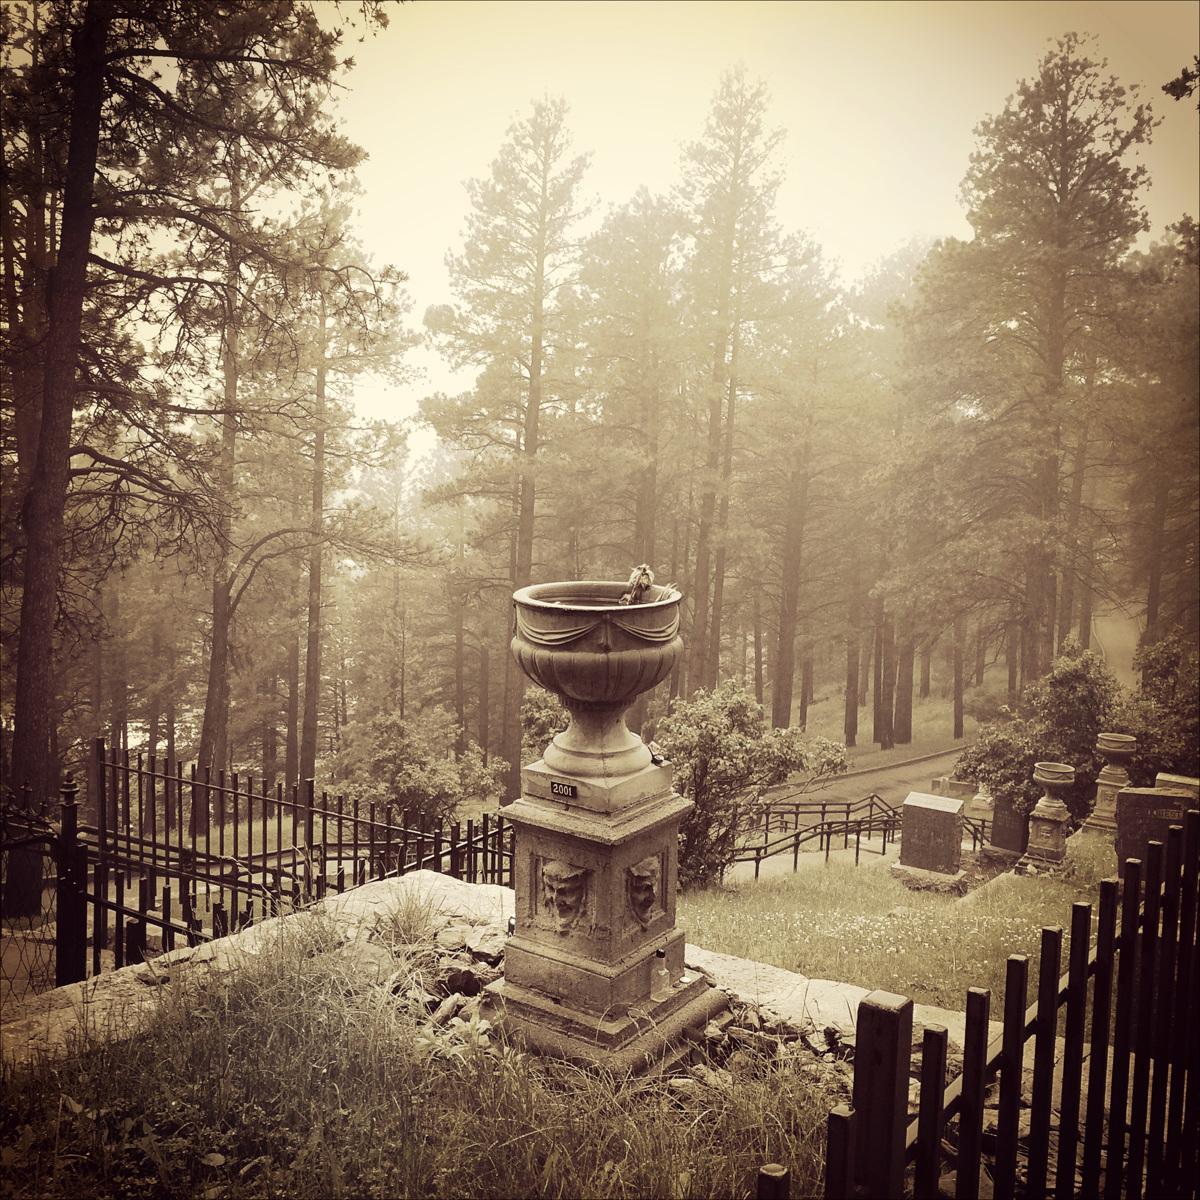 Calamity Jane's Gravesite, Deadwood, SD, 2015 (large view)